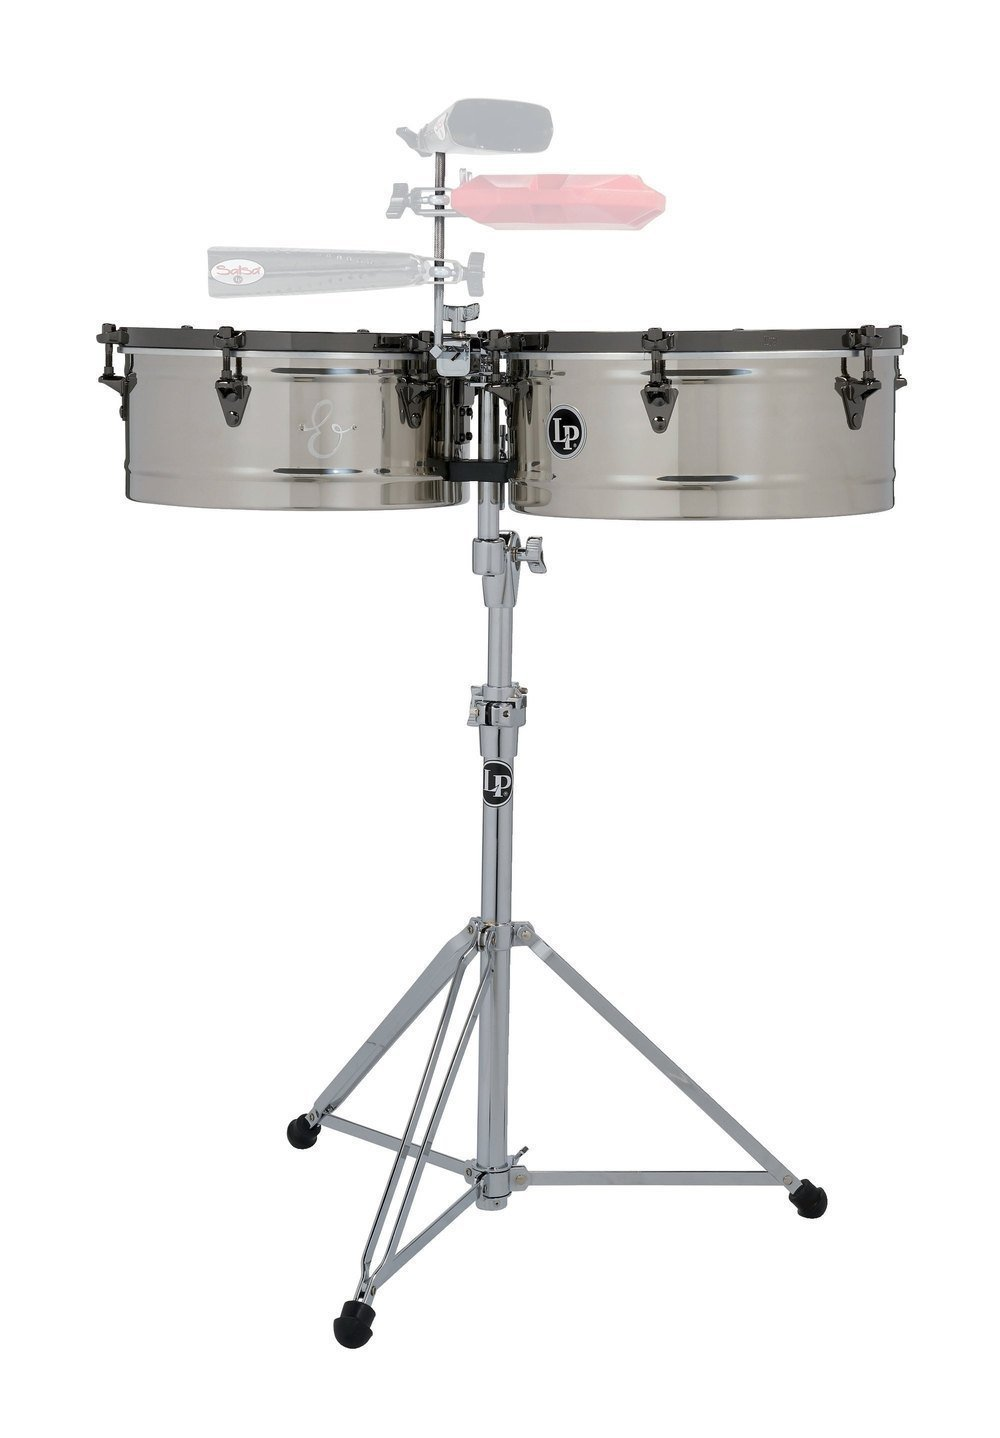 Тімбалес Latin Percussion LP1415-EC E-Class Stainless Steel